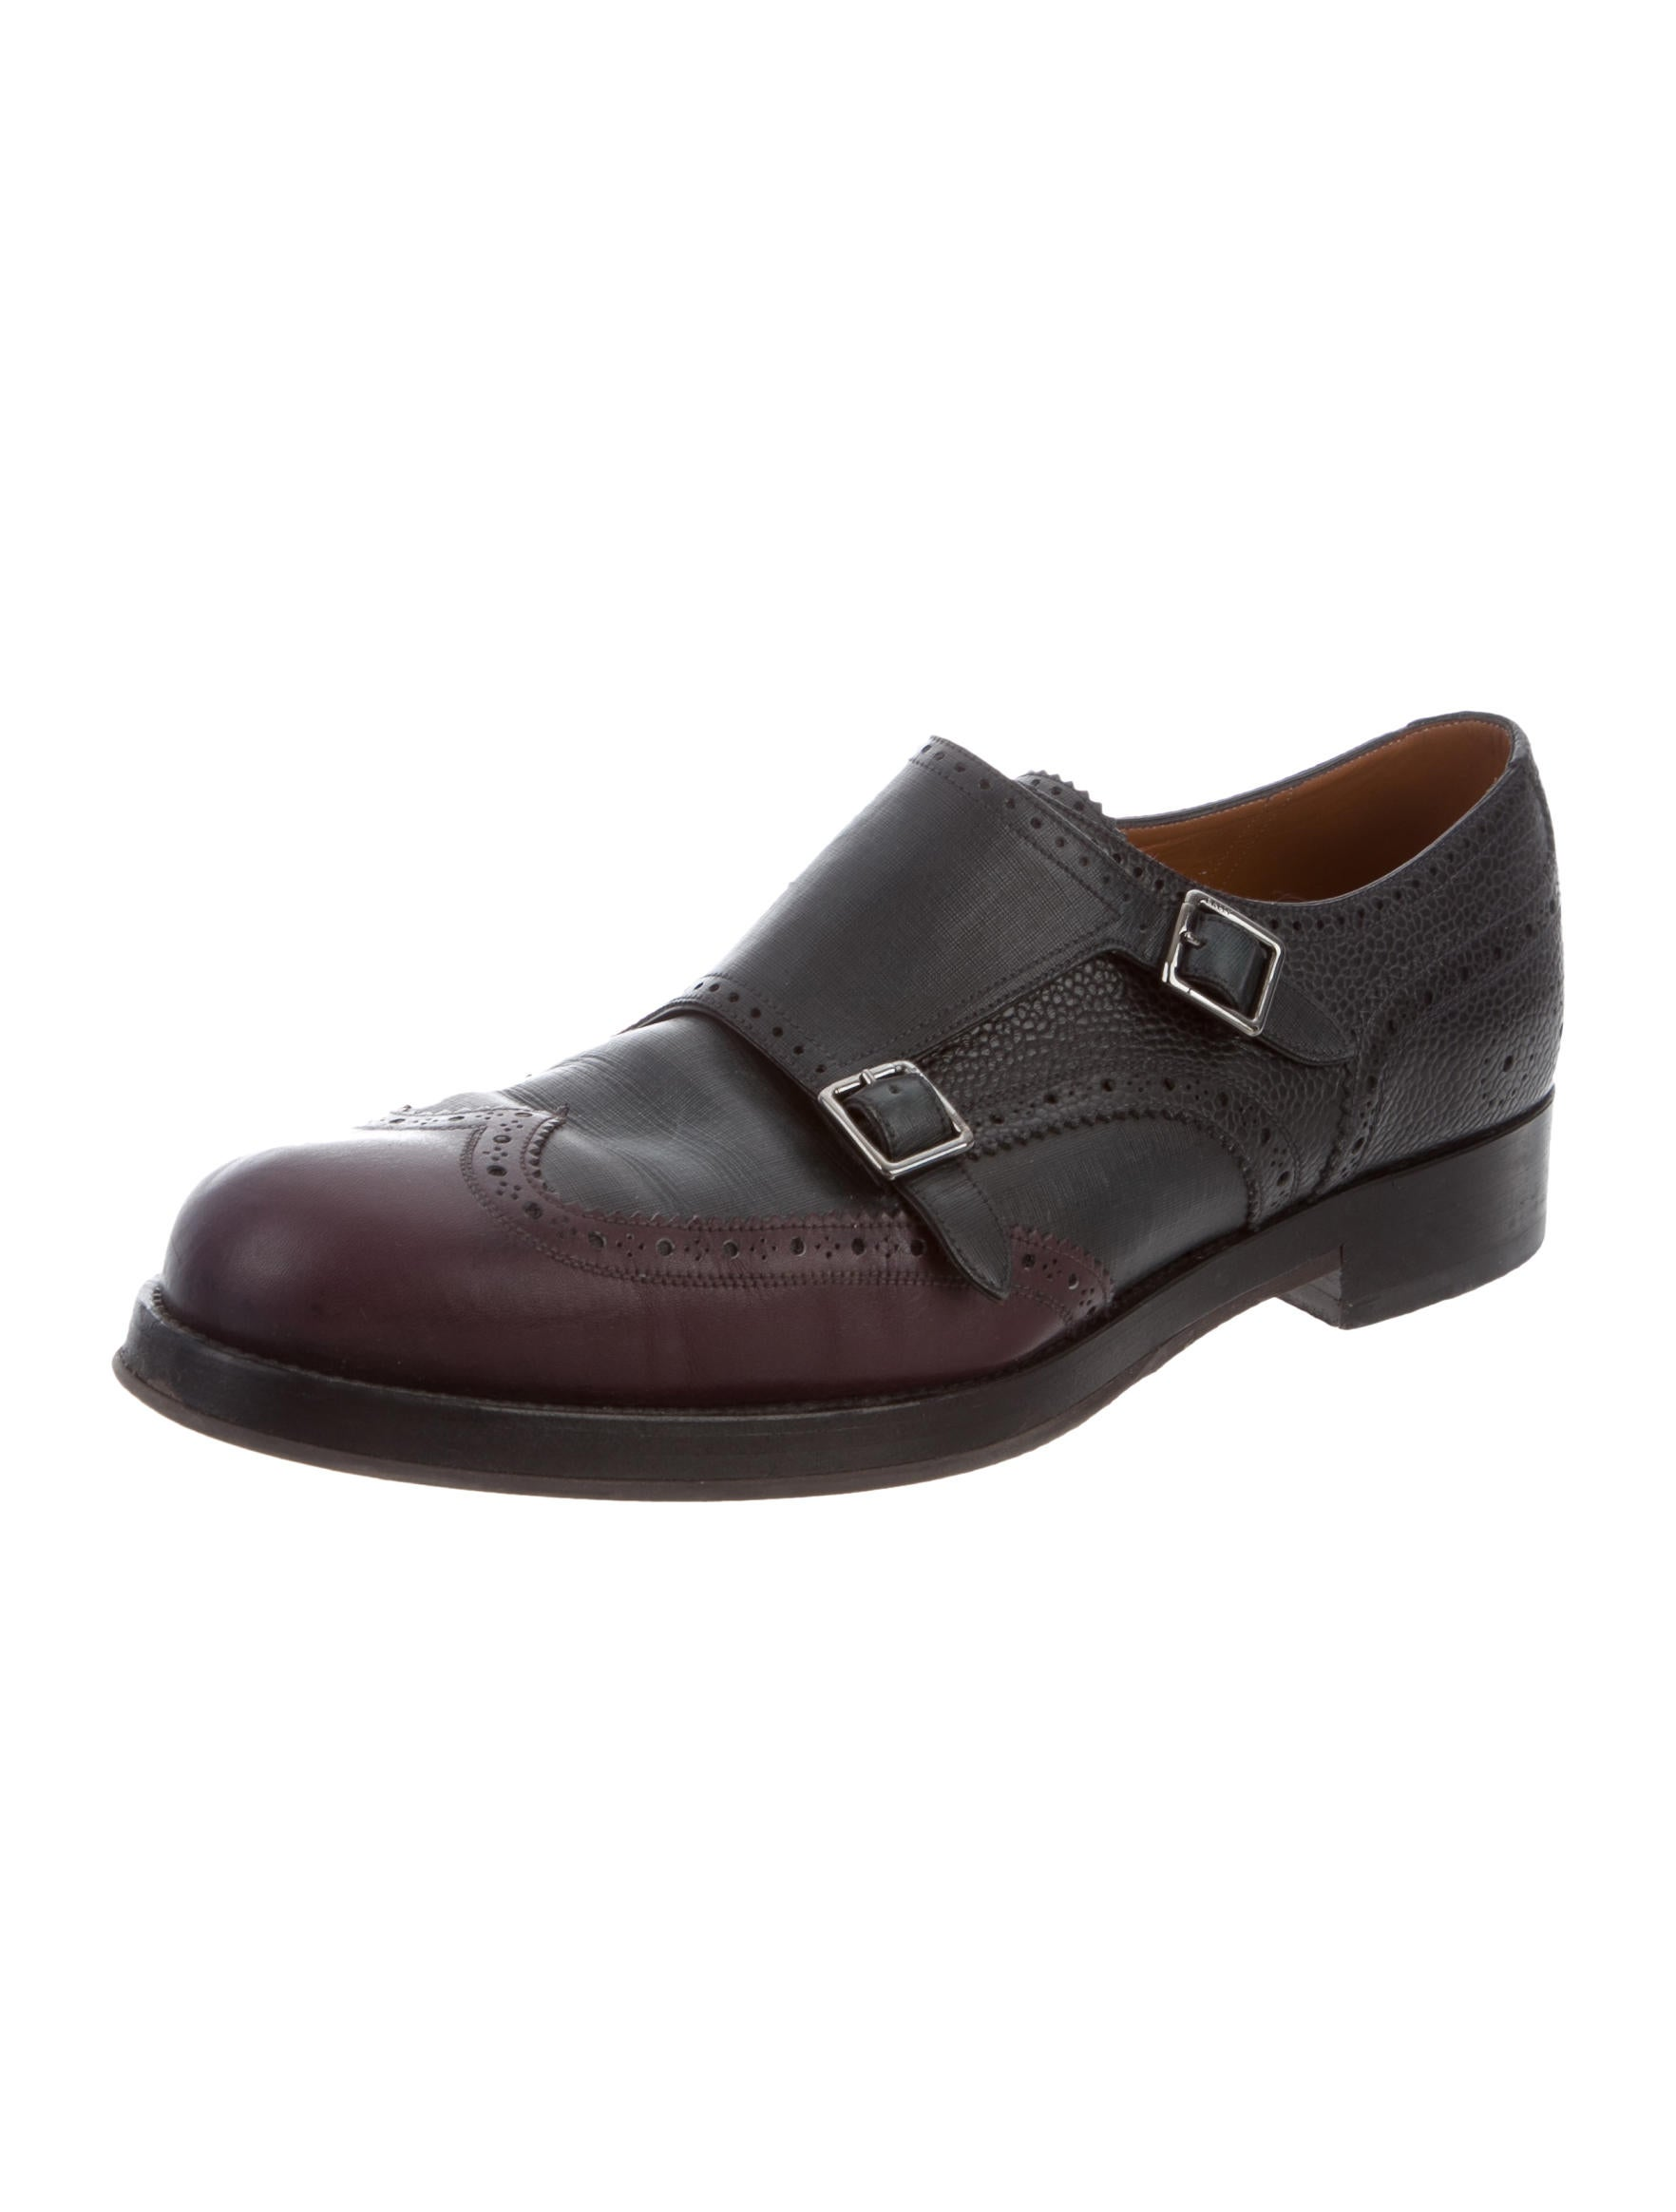 Bally Double Monk Straps Sale Shoes